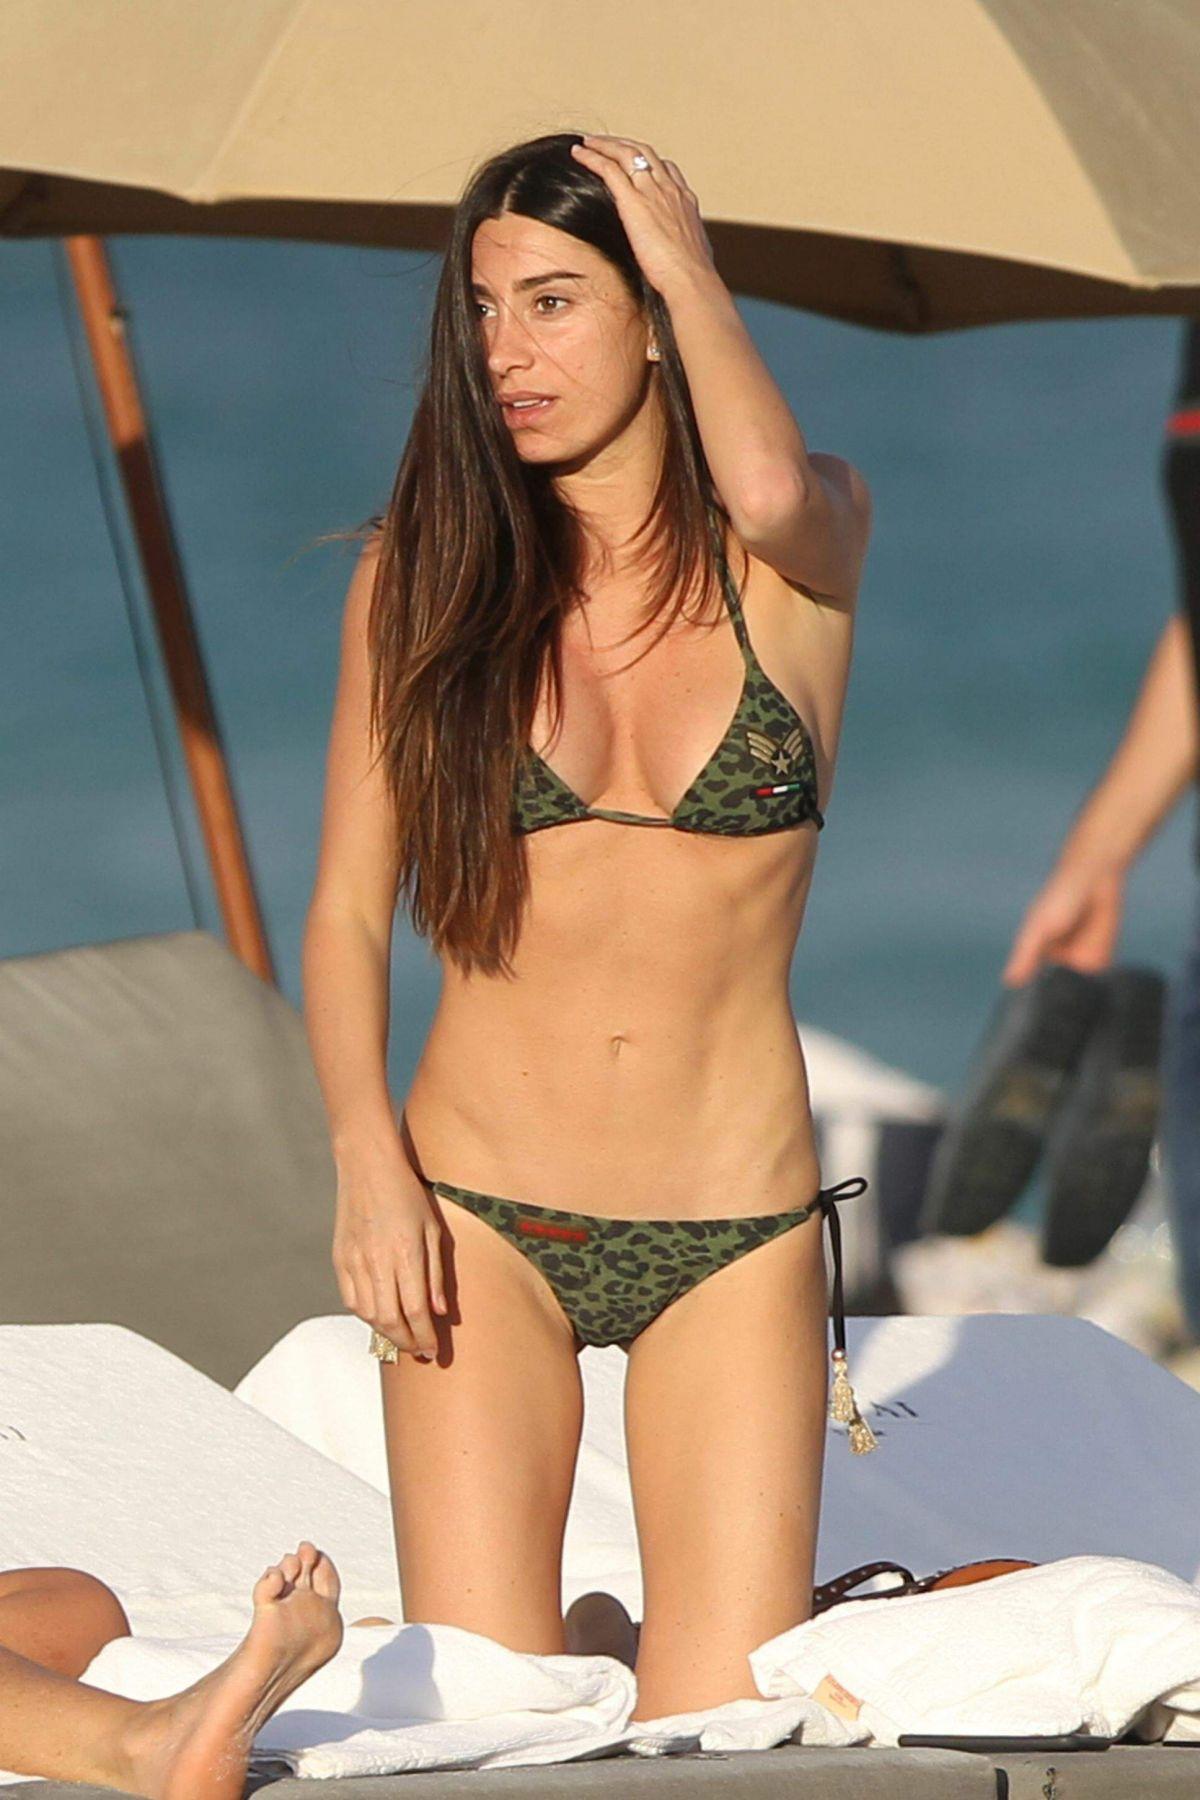 Bikini Nikki Grahame nude photos 2019